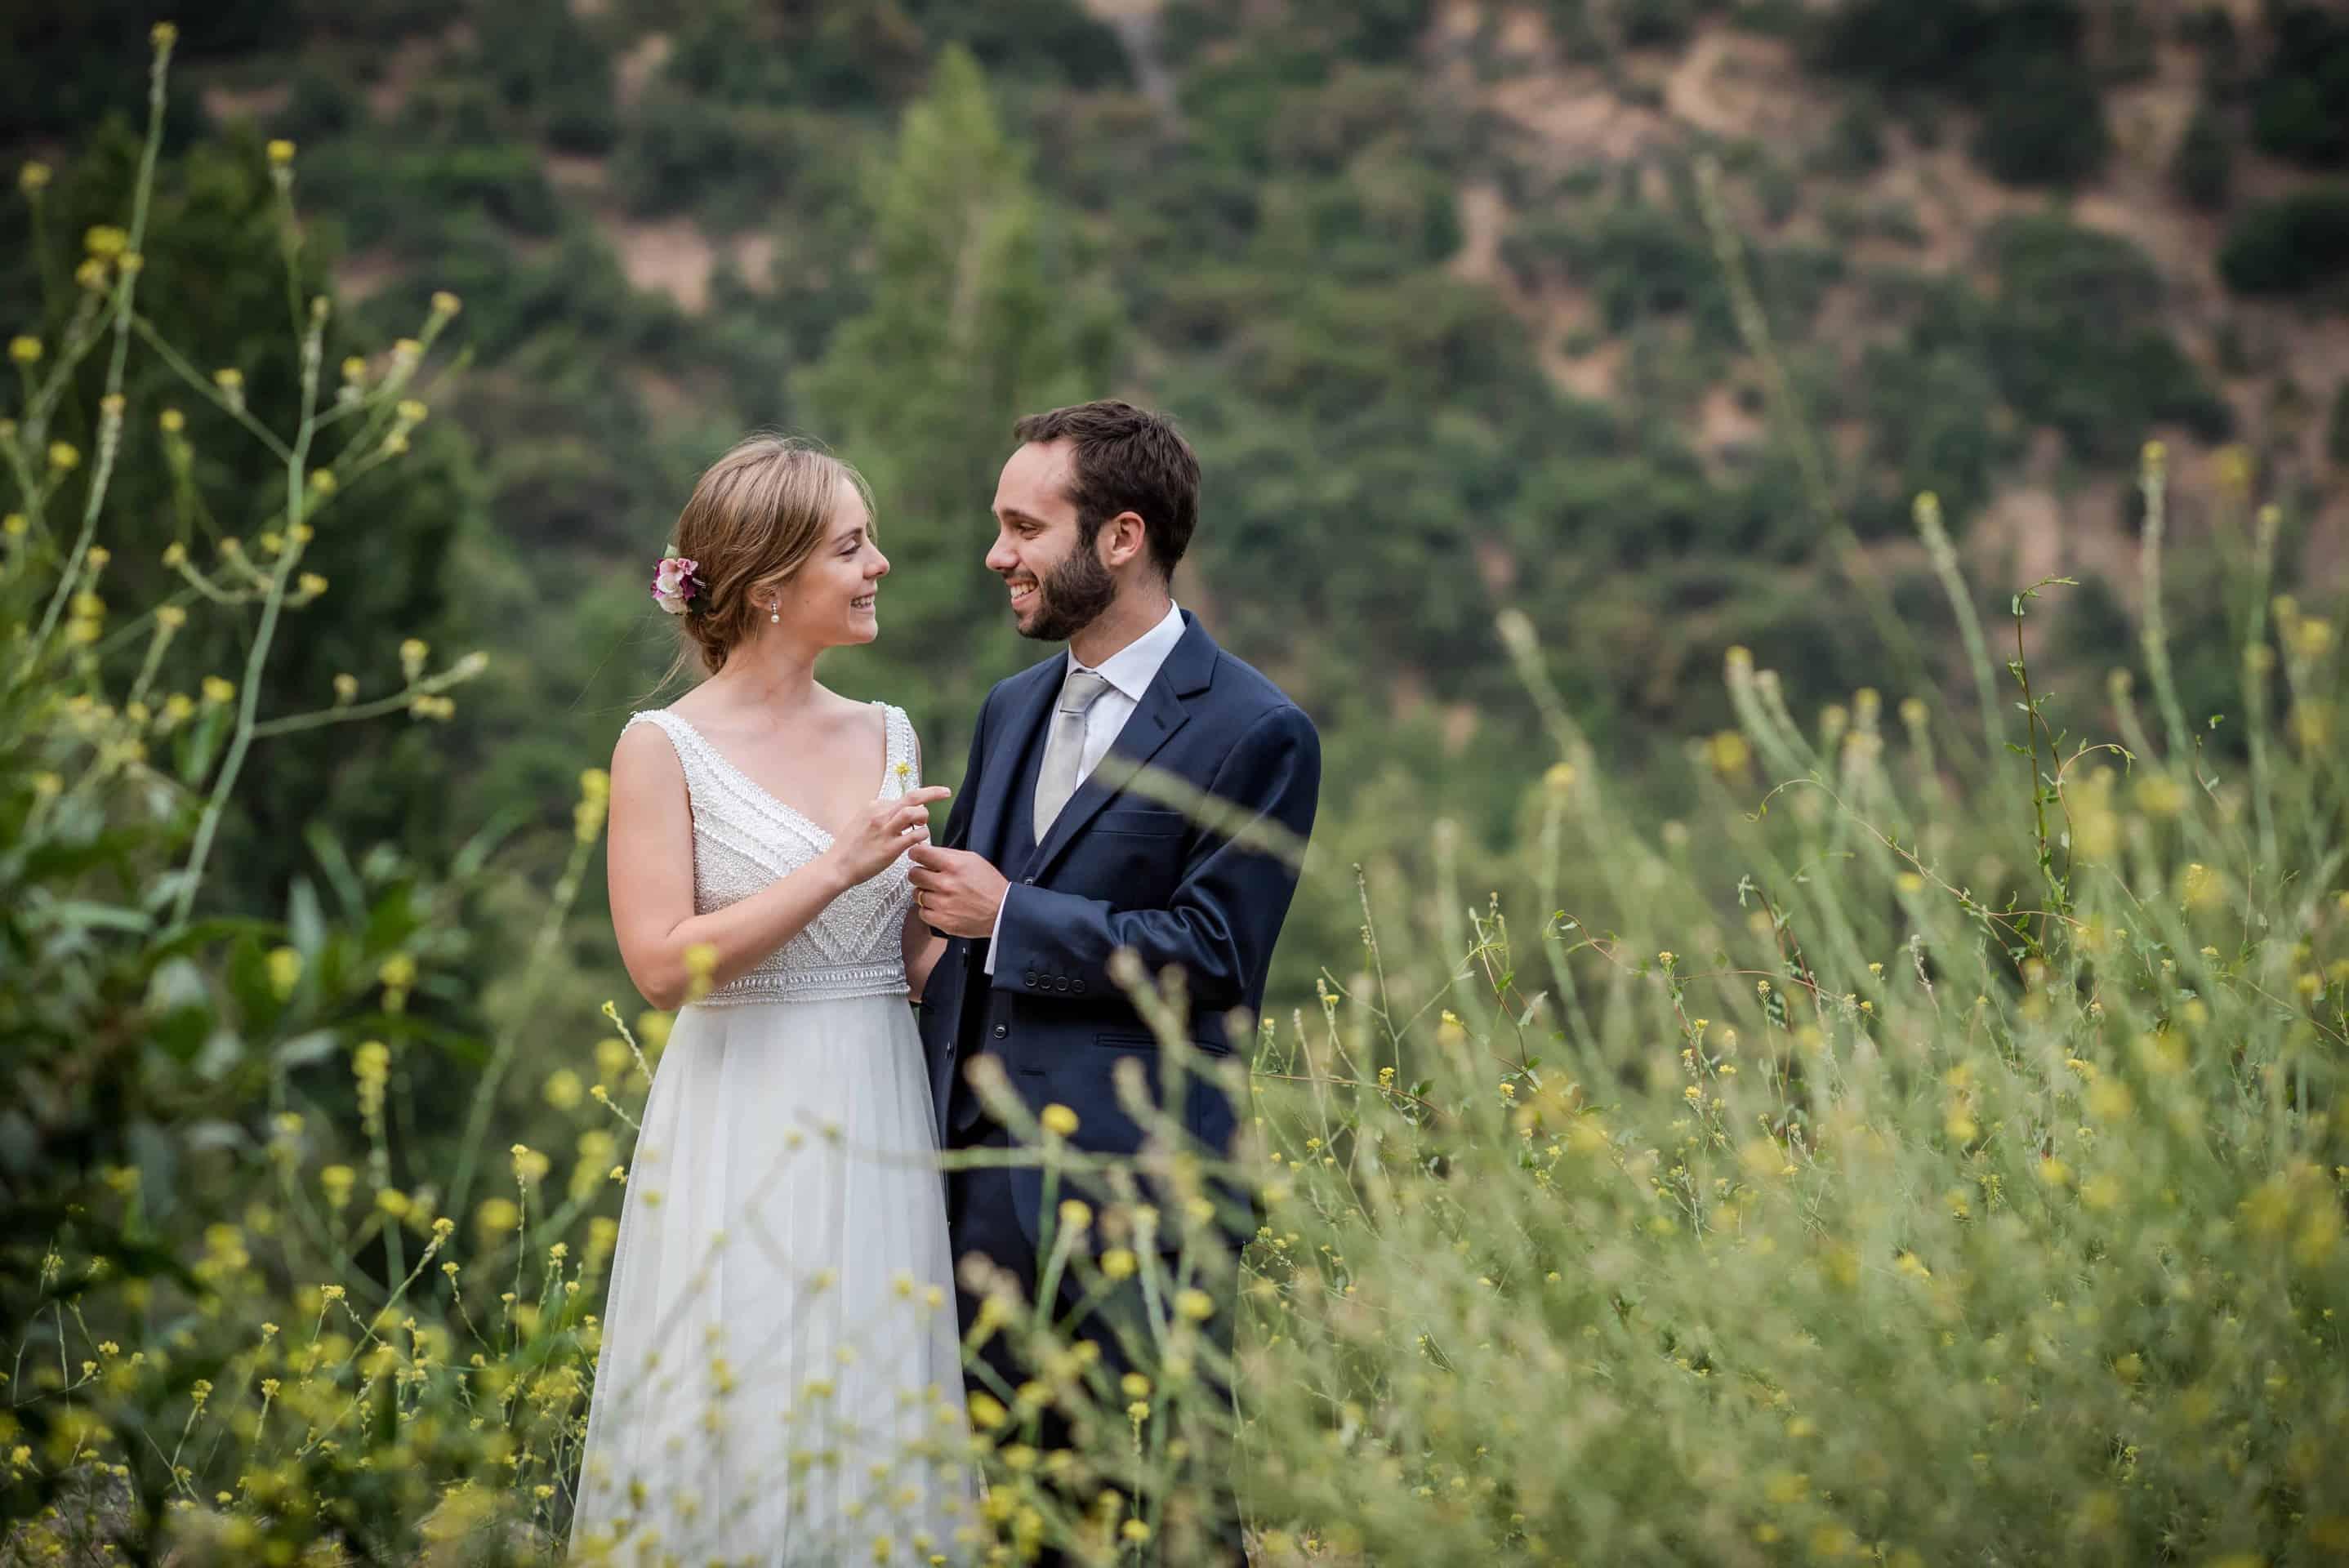 Post wedding shoot just outside Santiago, Chile